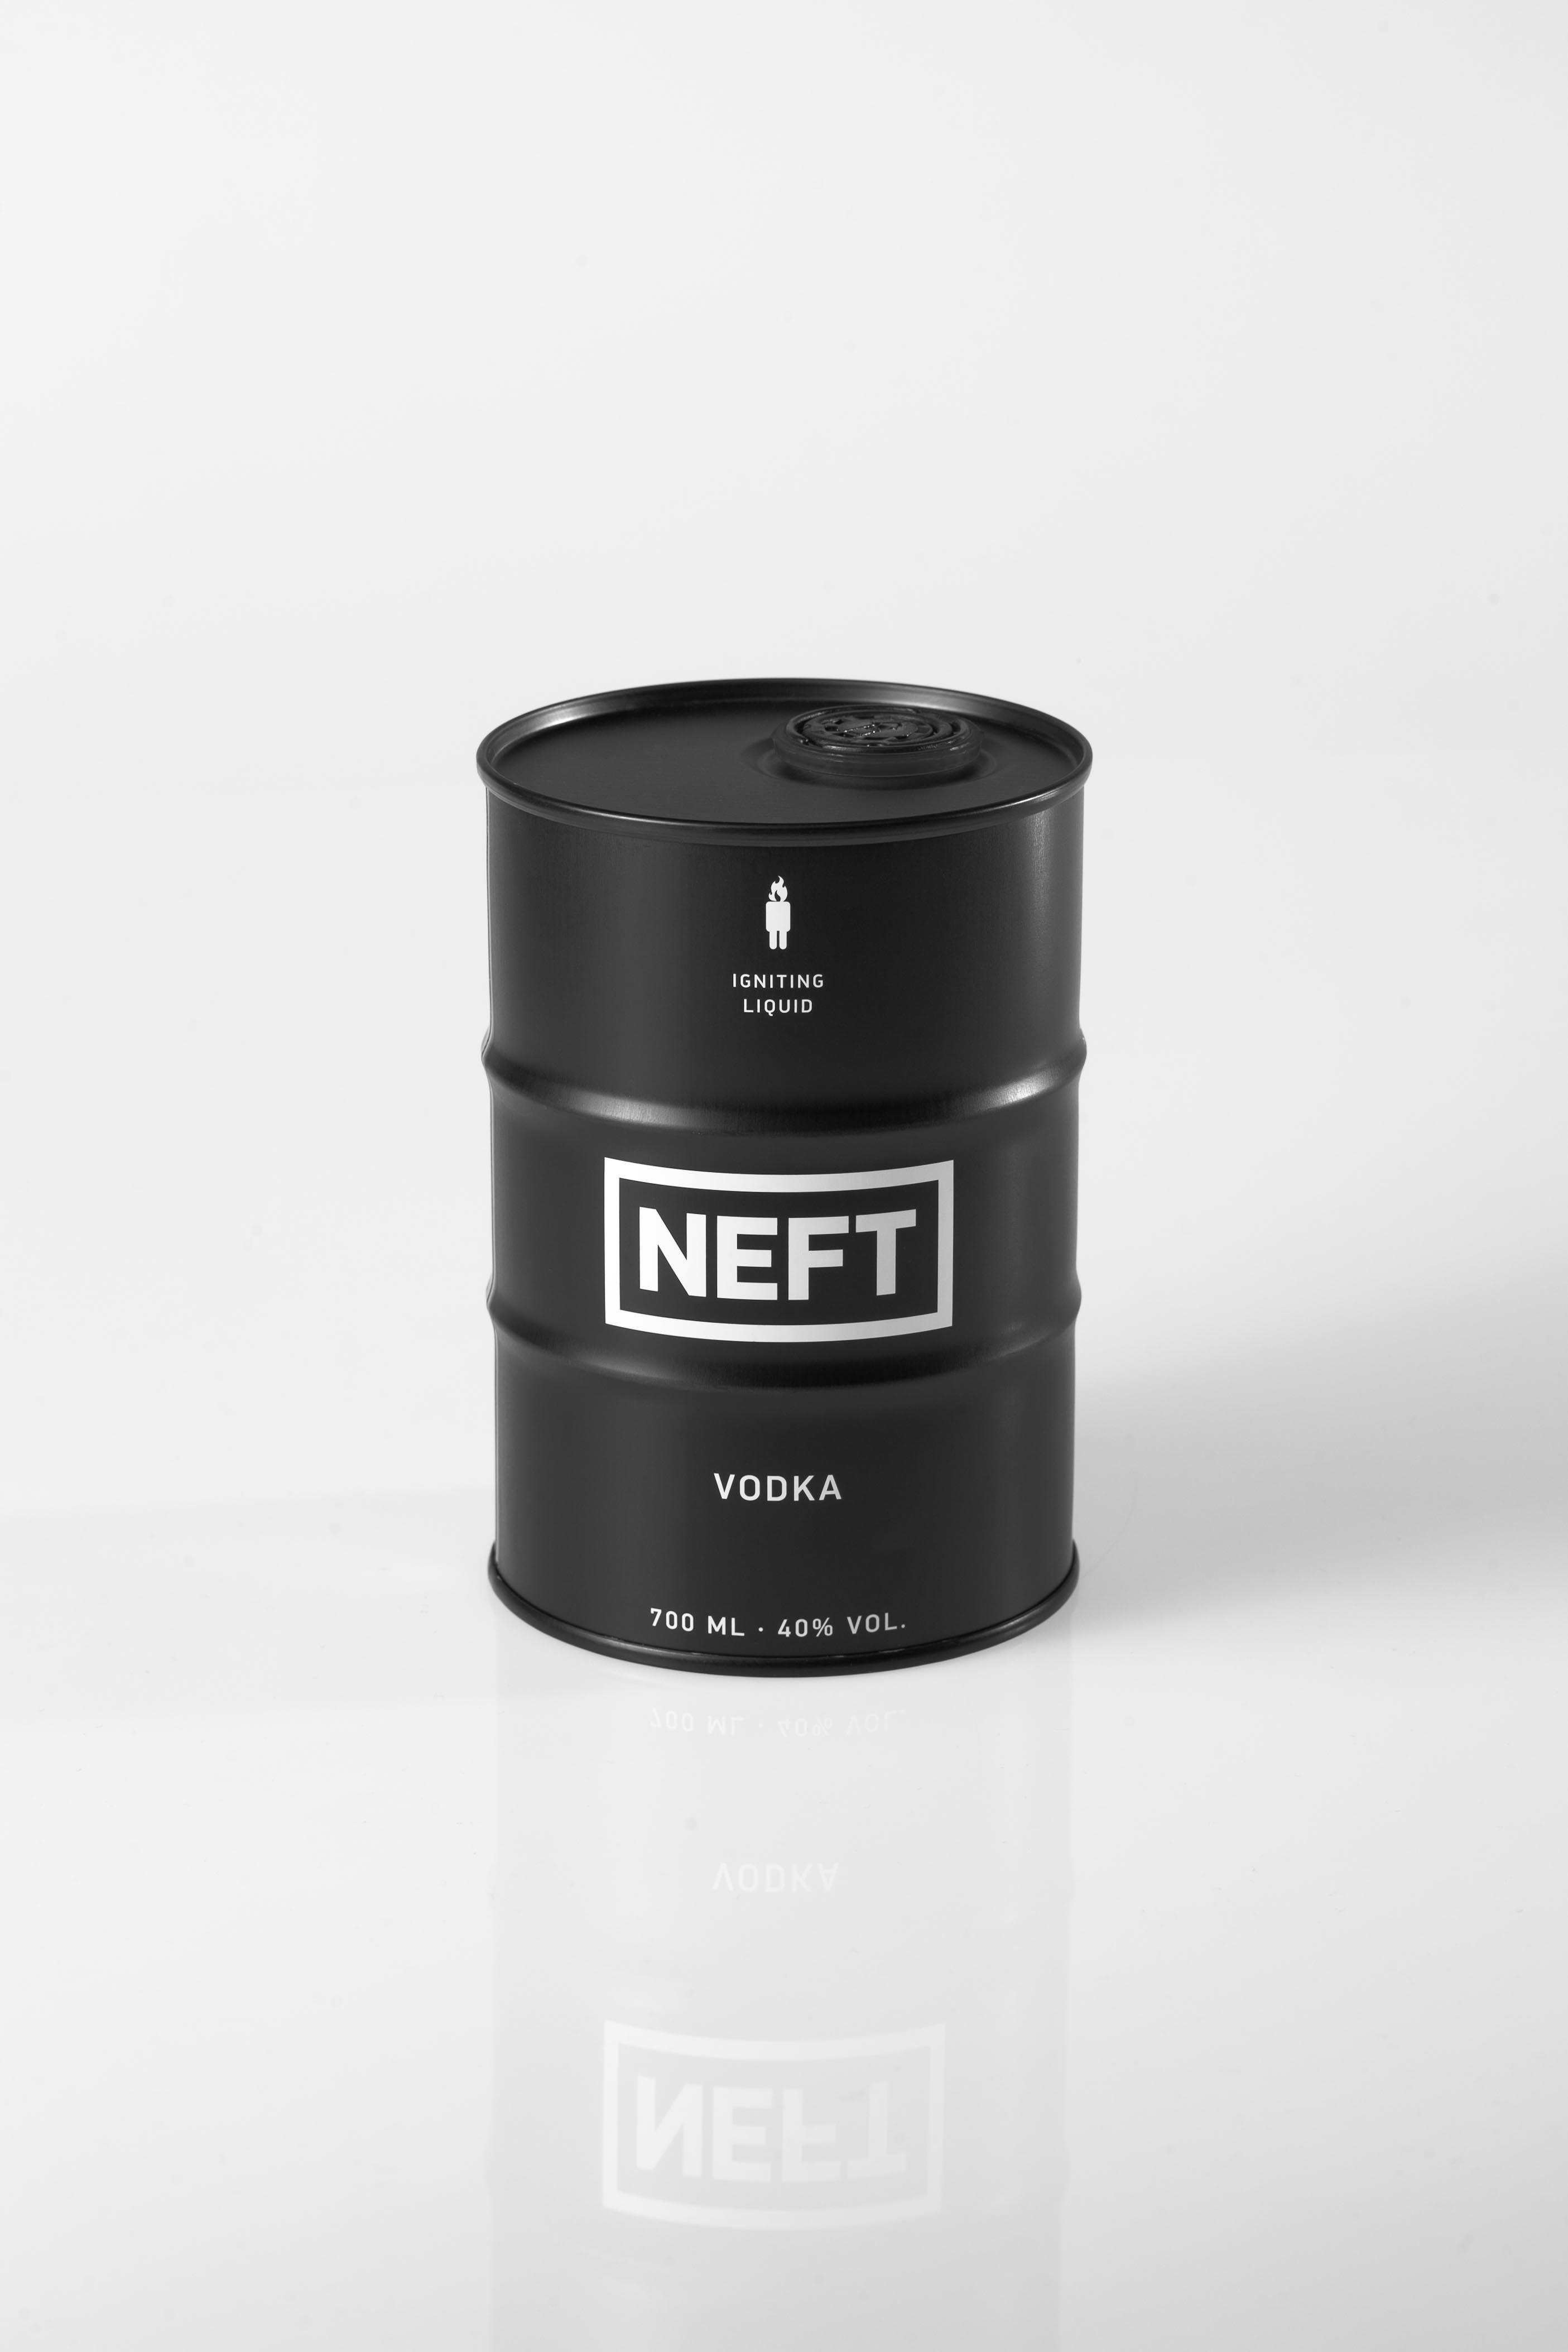 NEFT Vodka – Produktphotographie